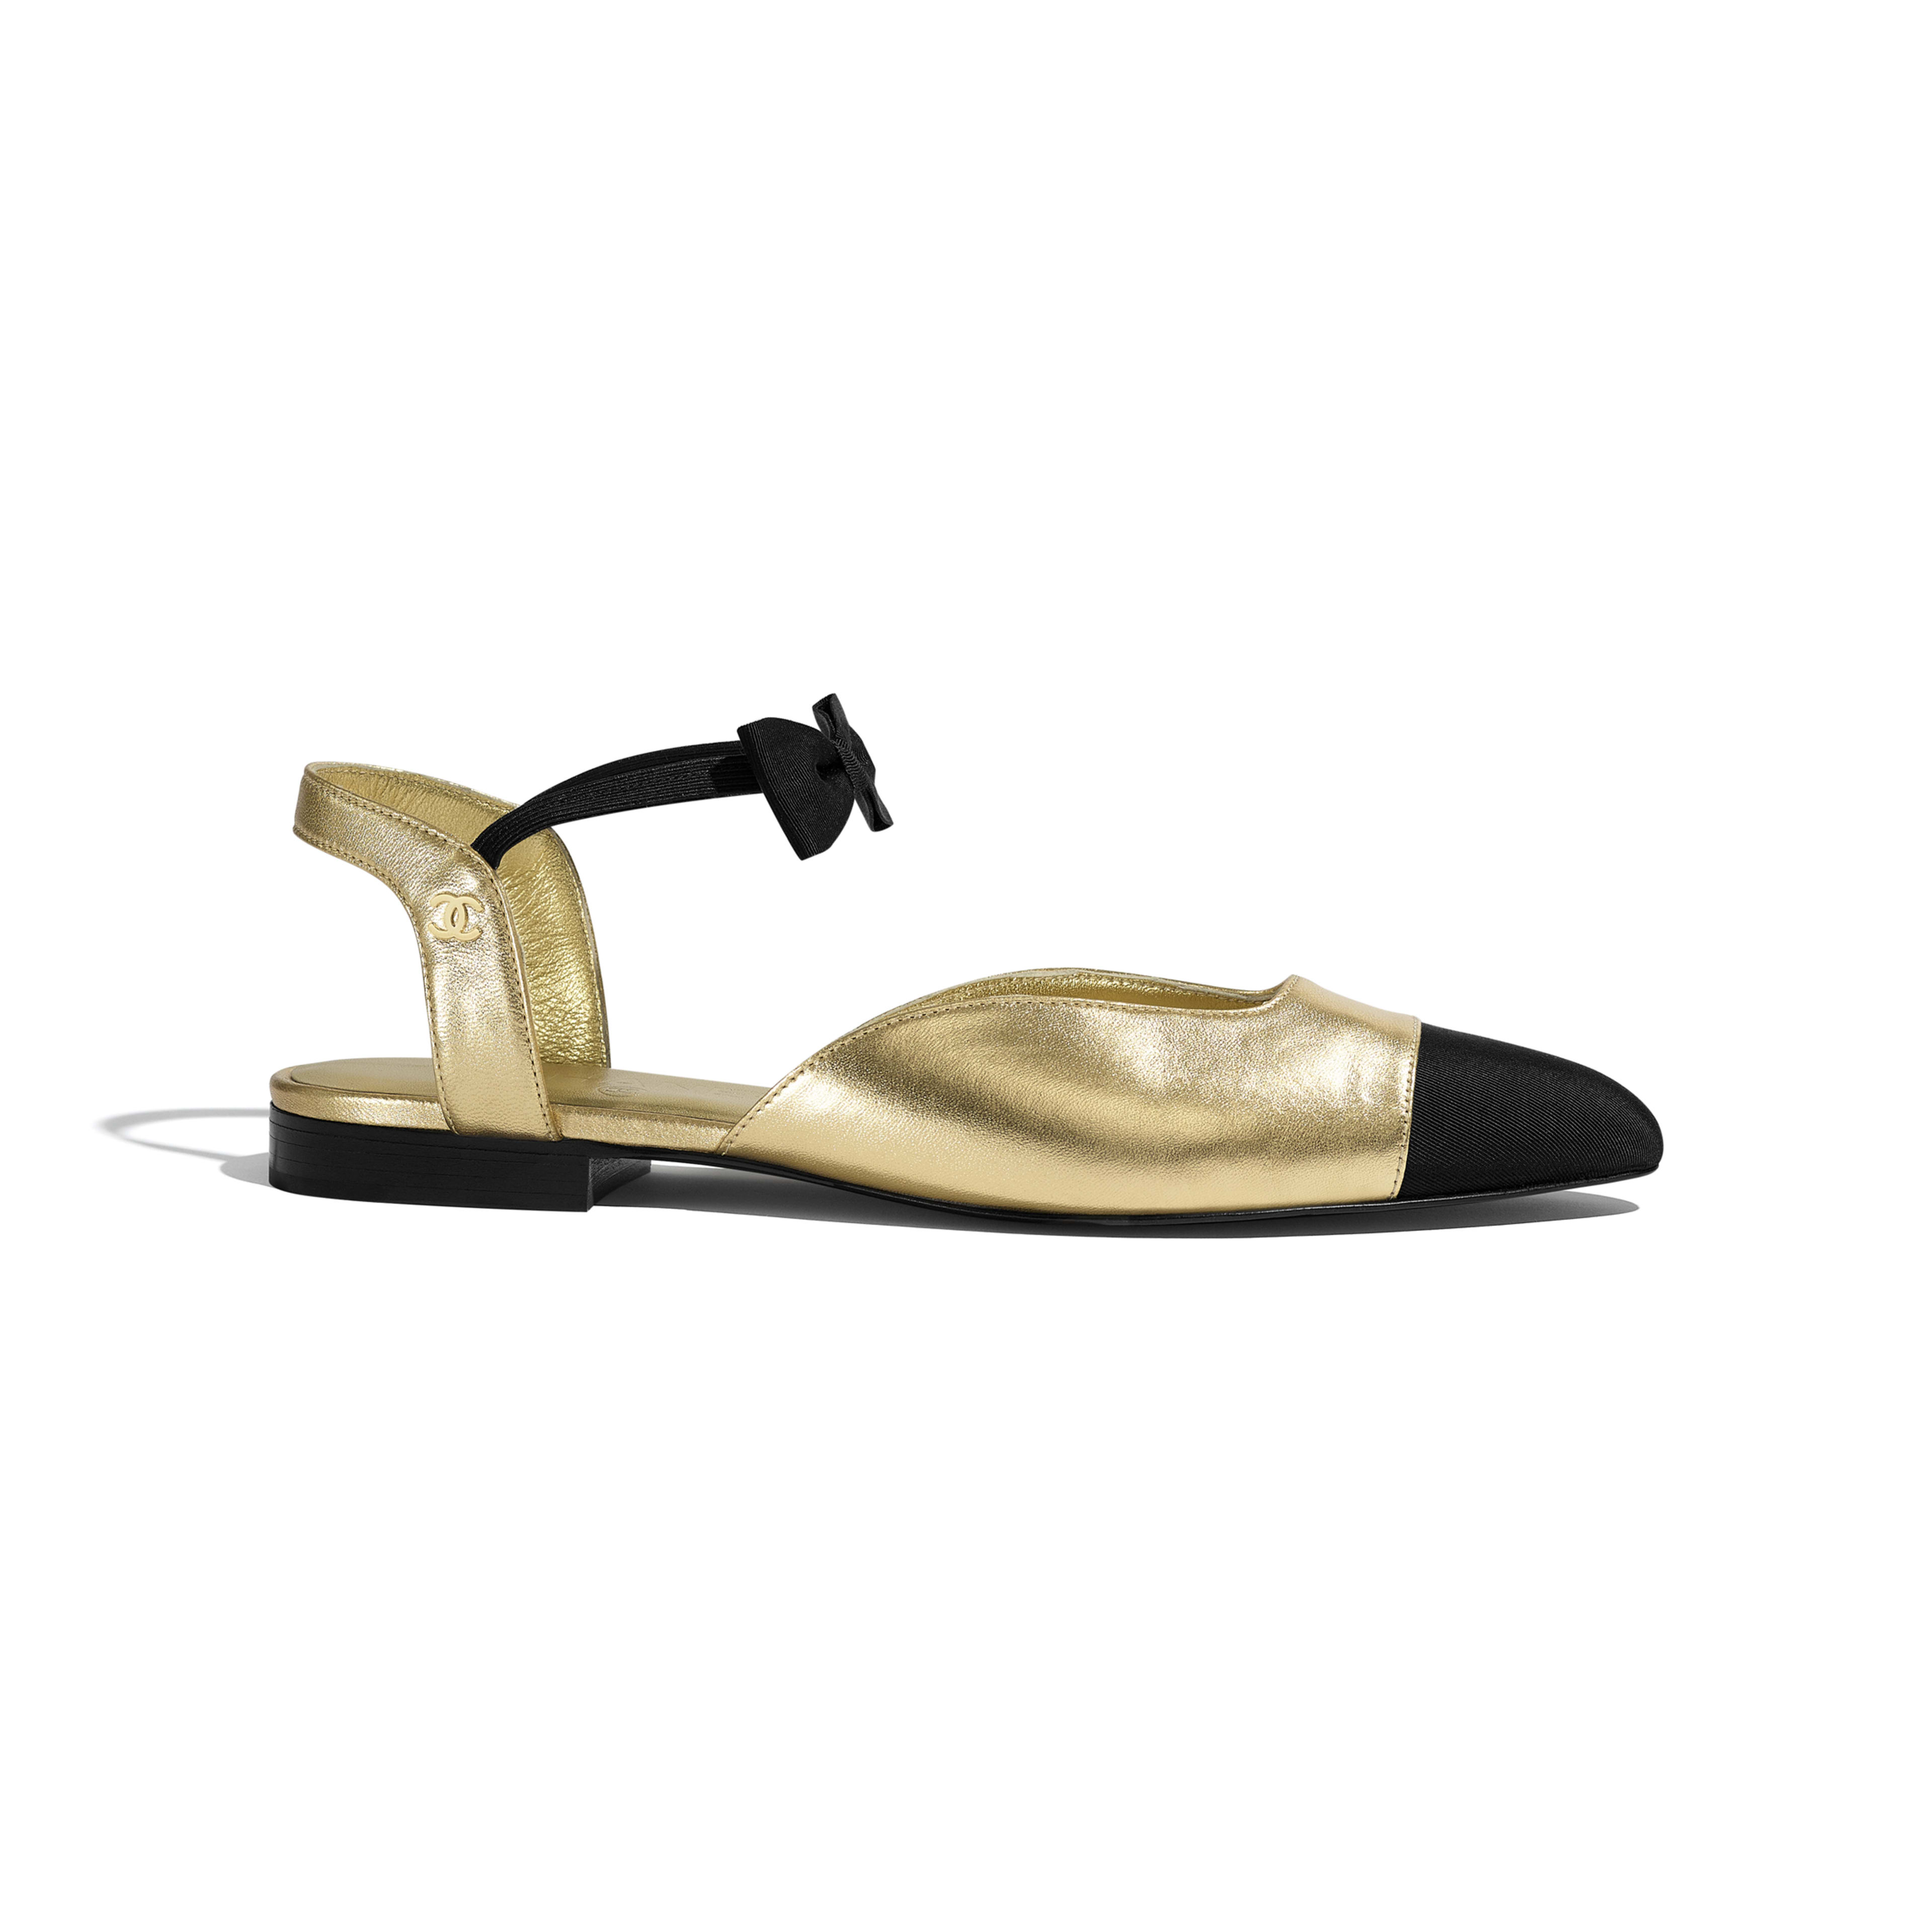 Grosgrain Gold \u0026 Black Mary Janes | CHANEL